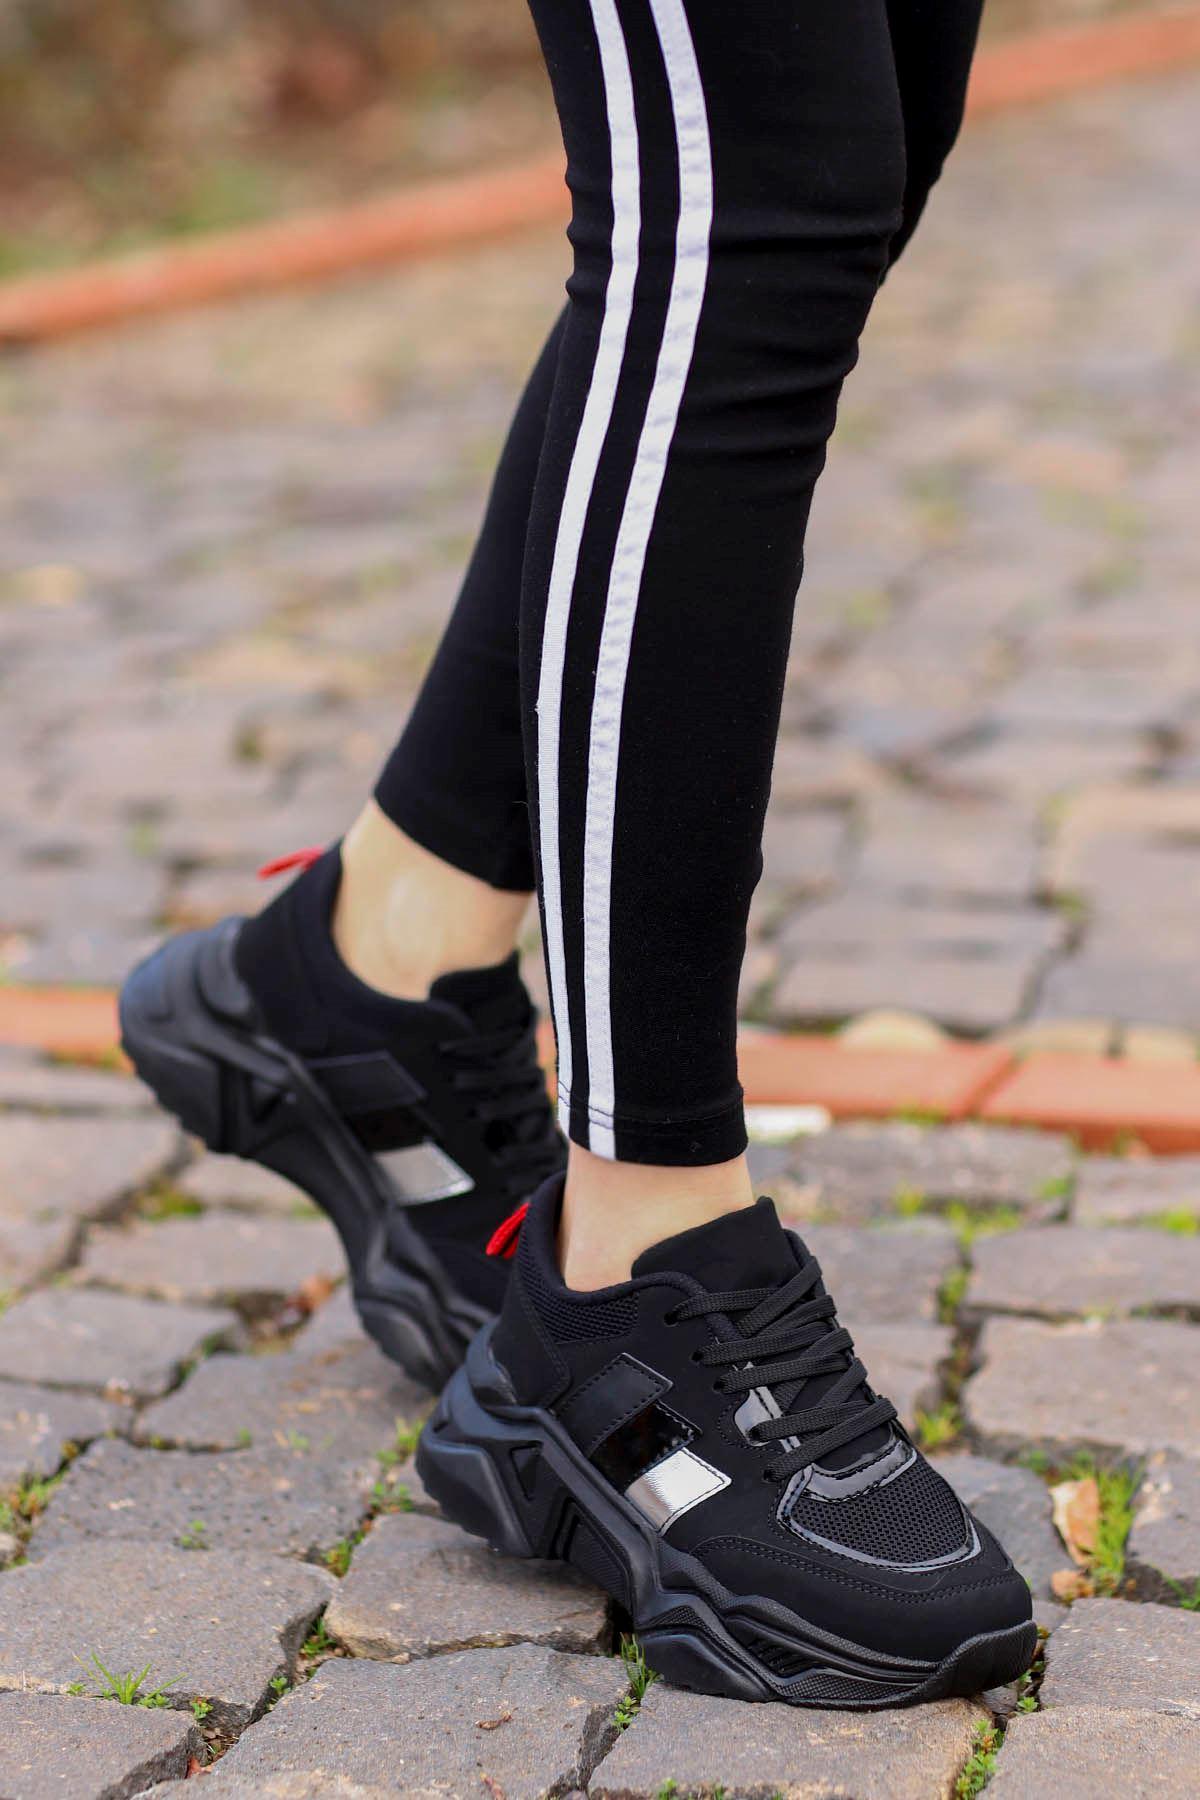 Dali Spor Ayakkabı Siyah Süet Siyah Taban